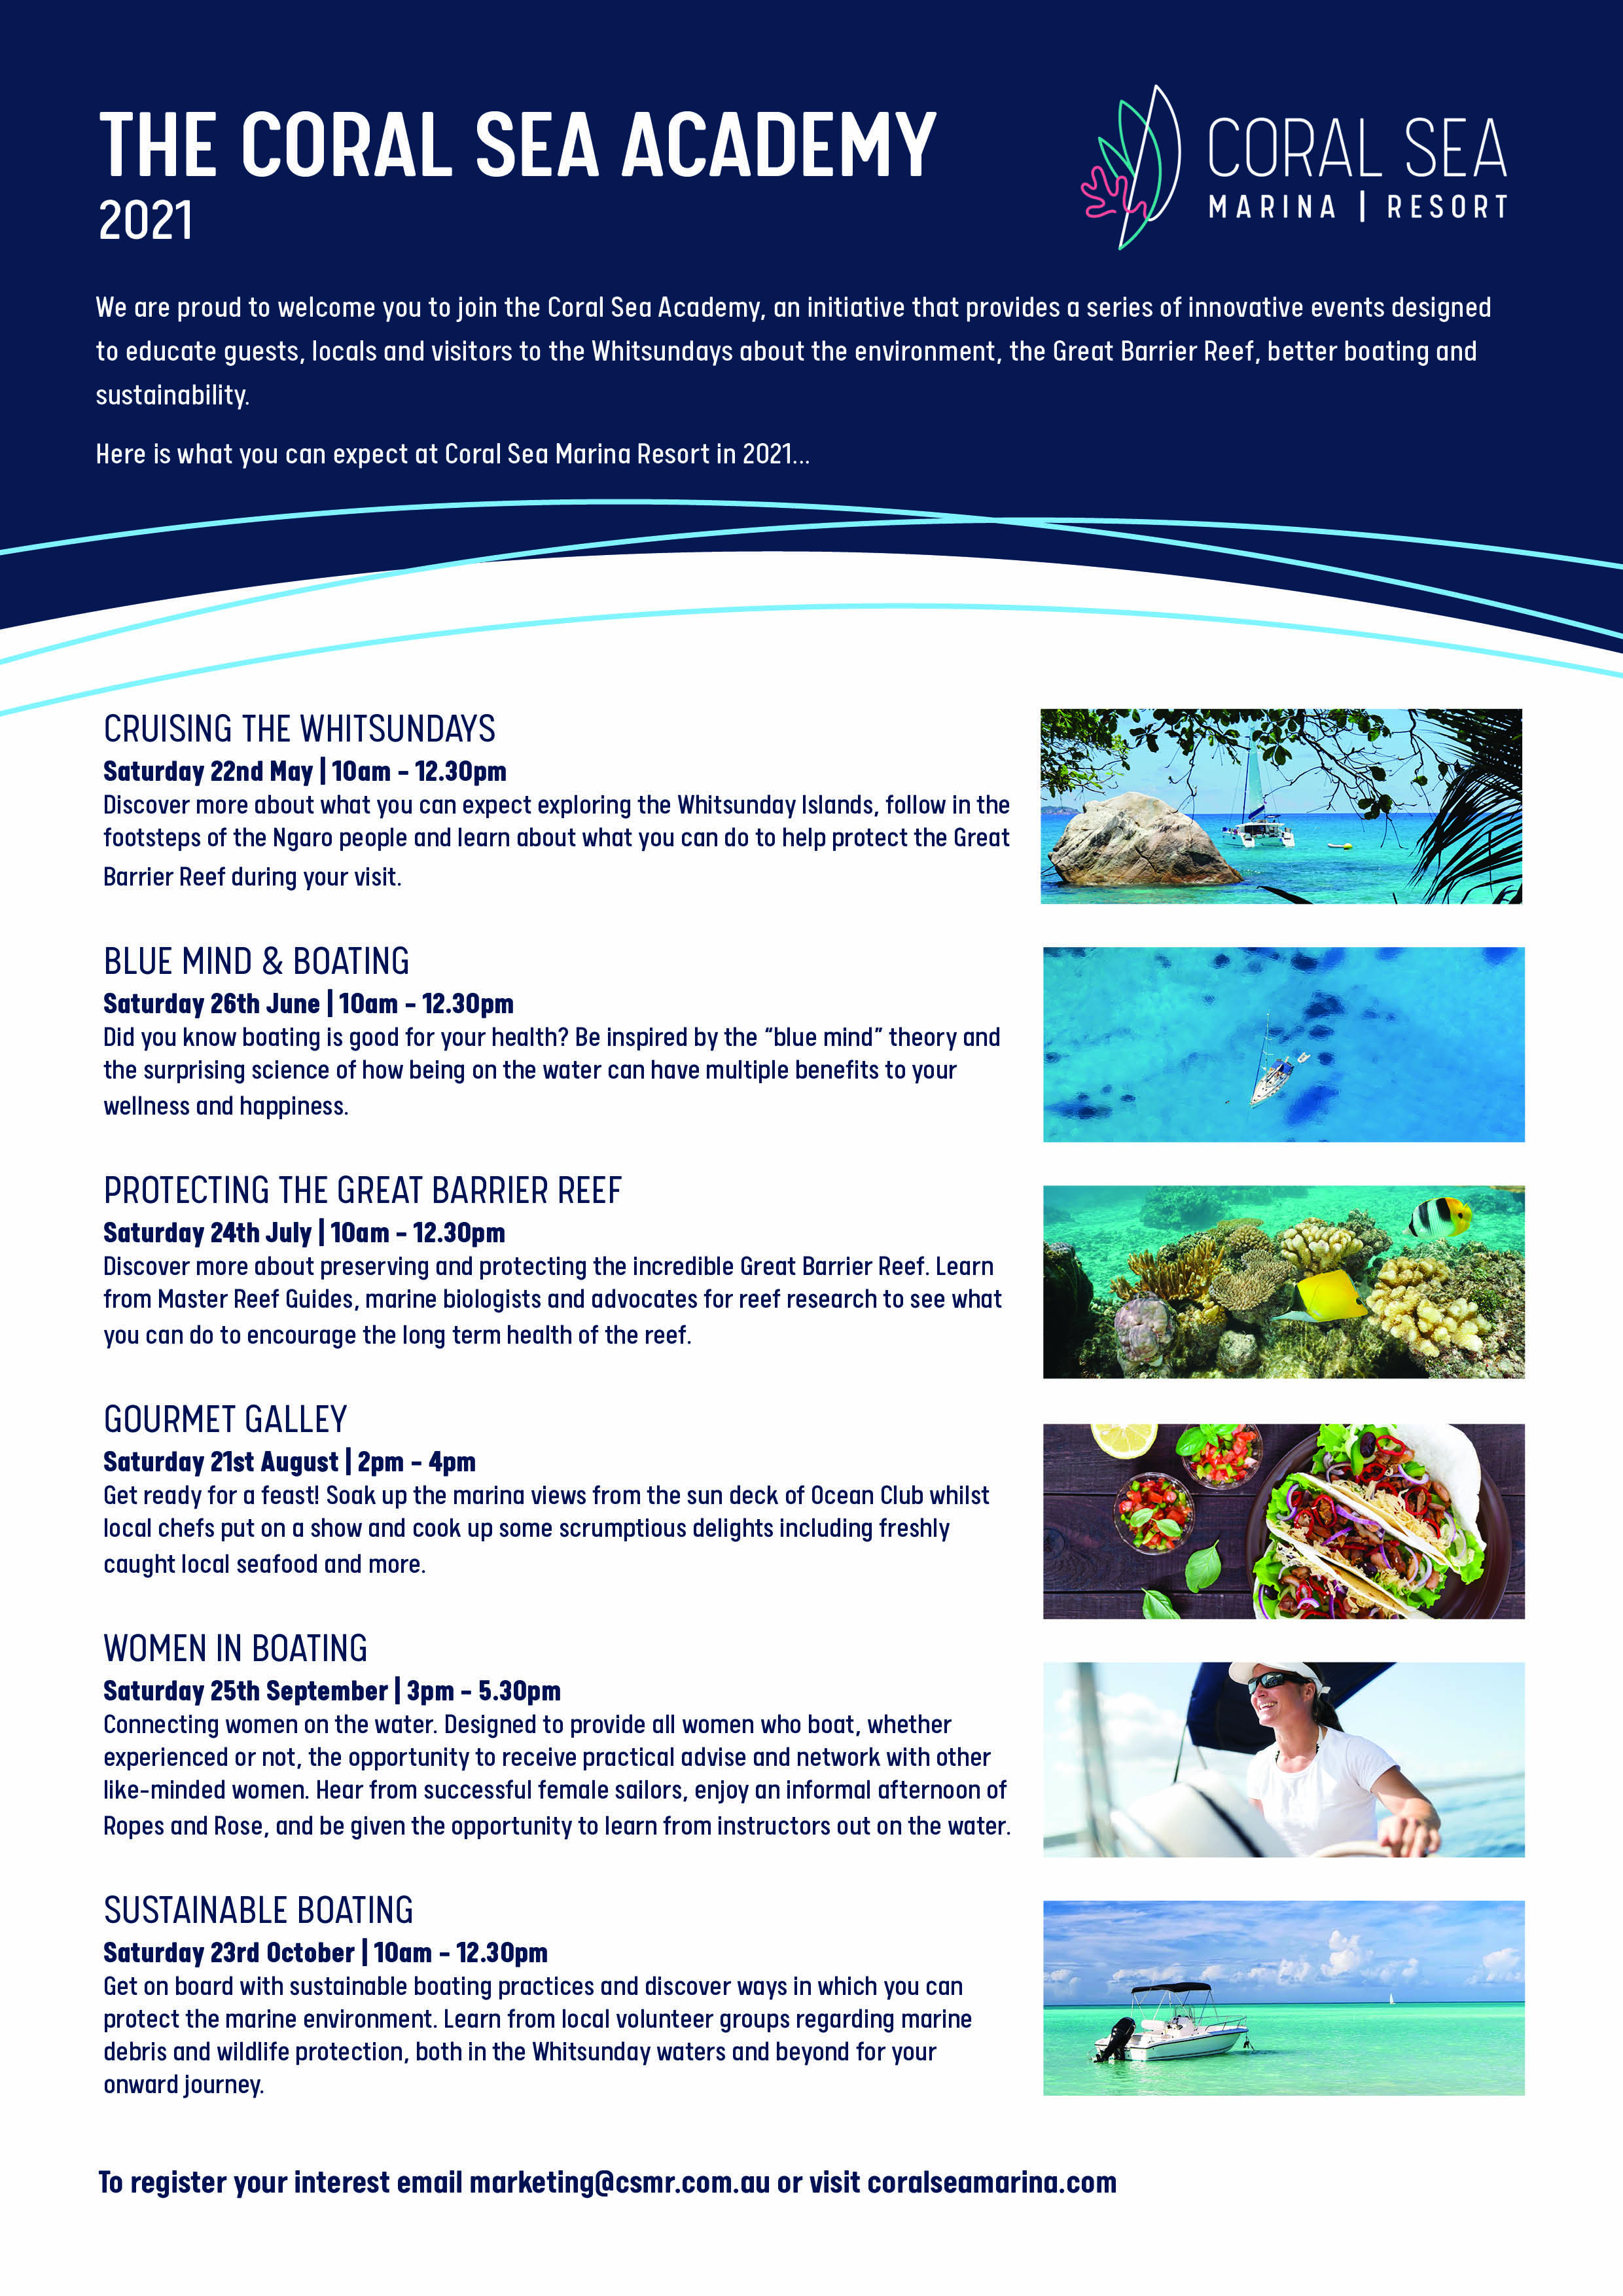 Coral Sea Academy 2021 Calendar of Events